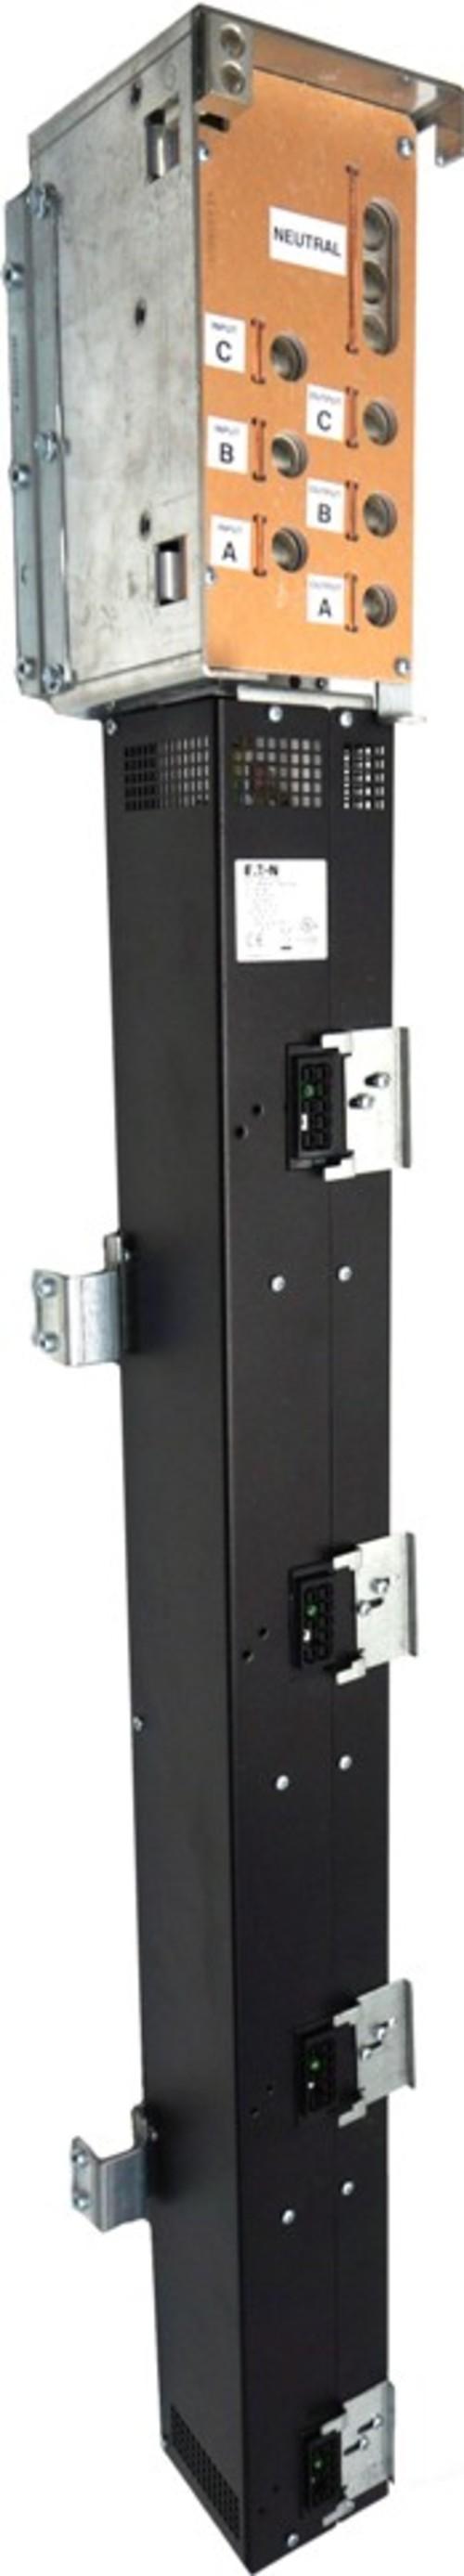 Eaton 103007828-5591 Bladeups Busbar - Top Entry - 4-high - 48kw - 3 Phase